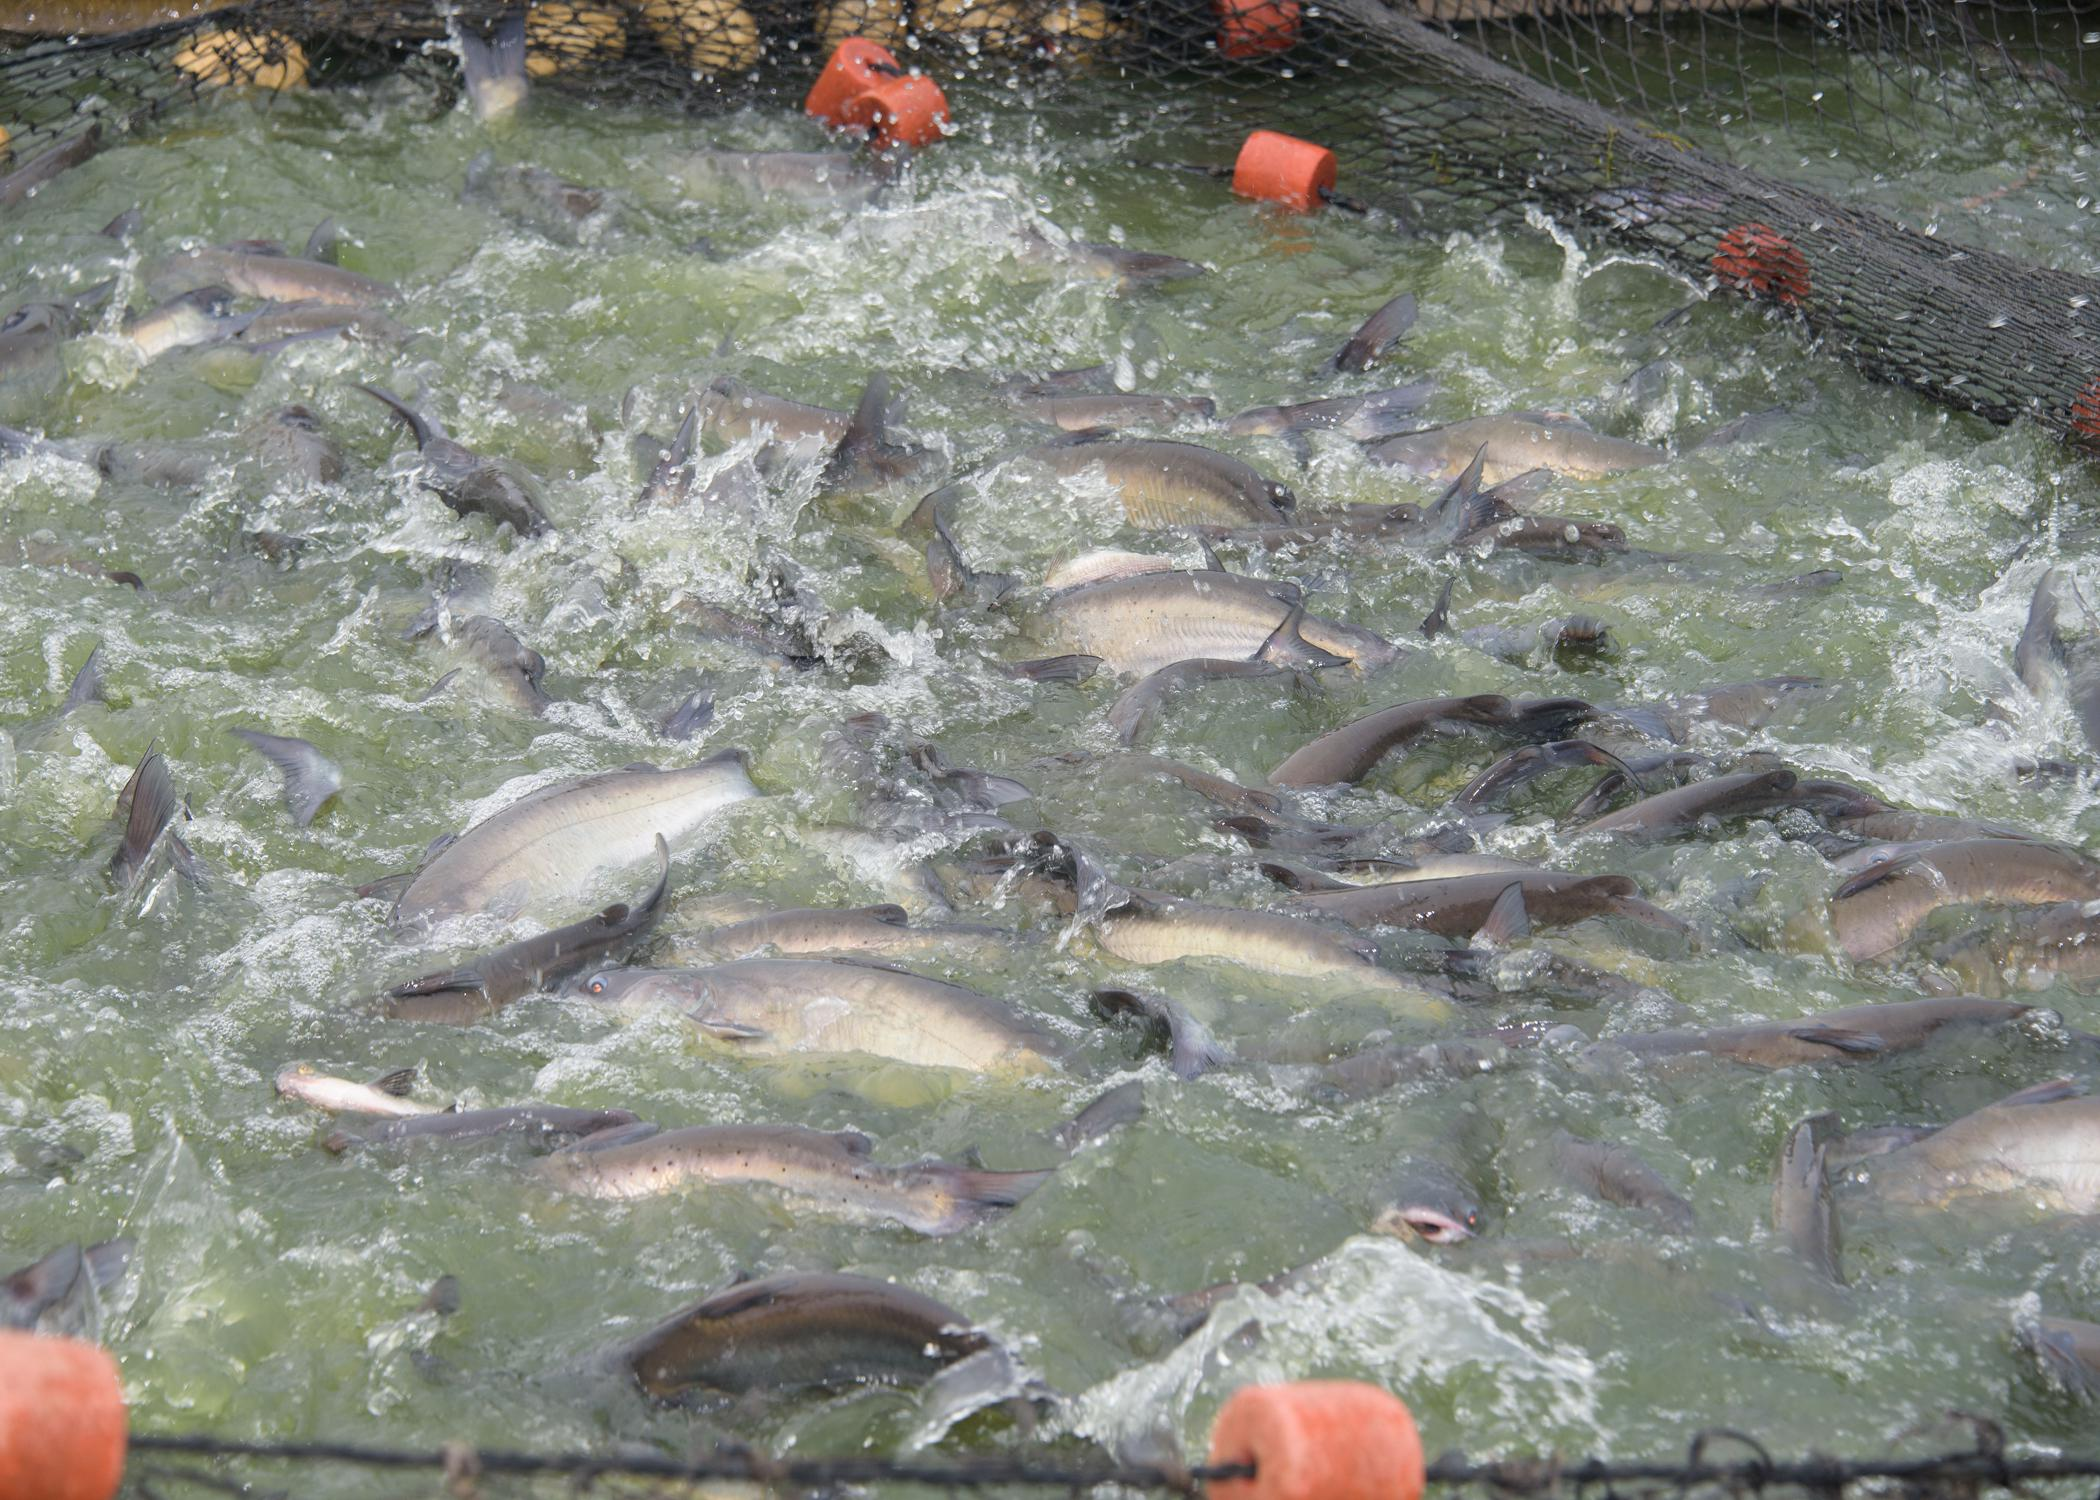 Catfish swimming above a net.